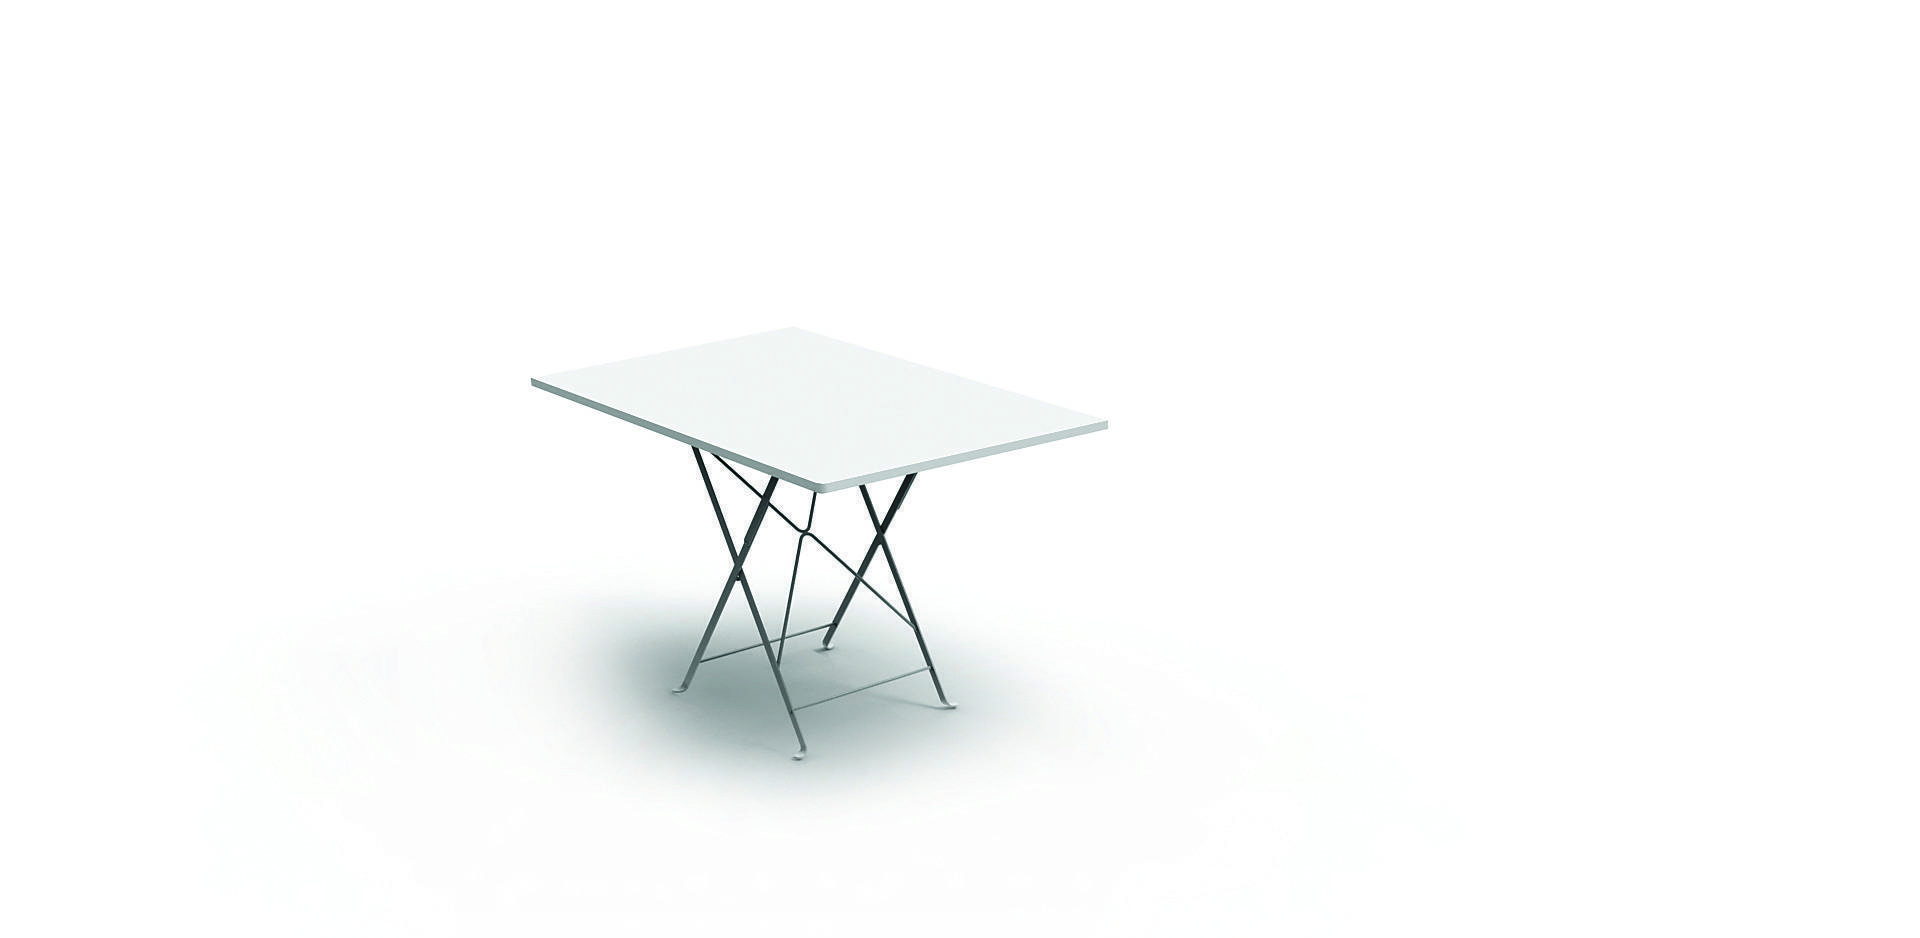 Tavolo Pieghevole Ed Allungabile.Vivereverde Tavolo Pieghevole Roy 110 Tavoli Da Giardino